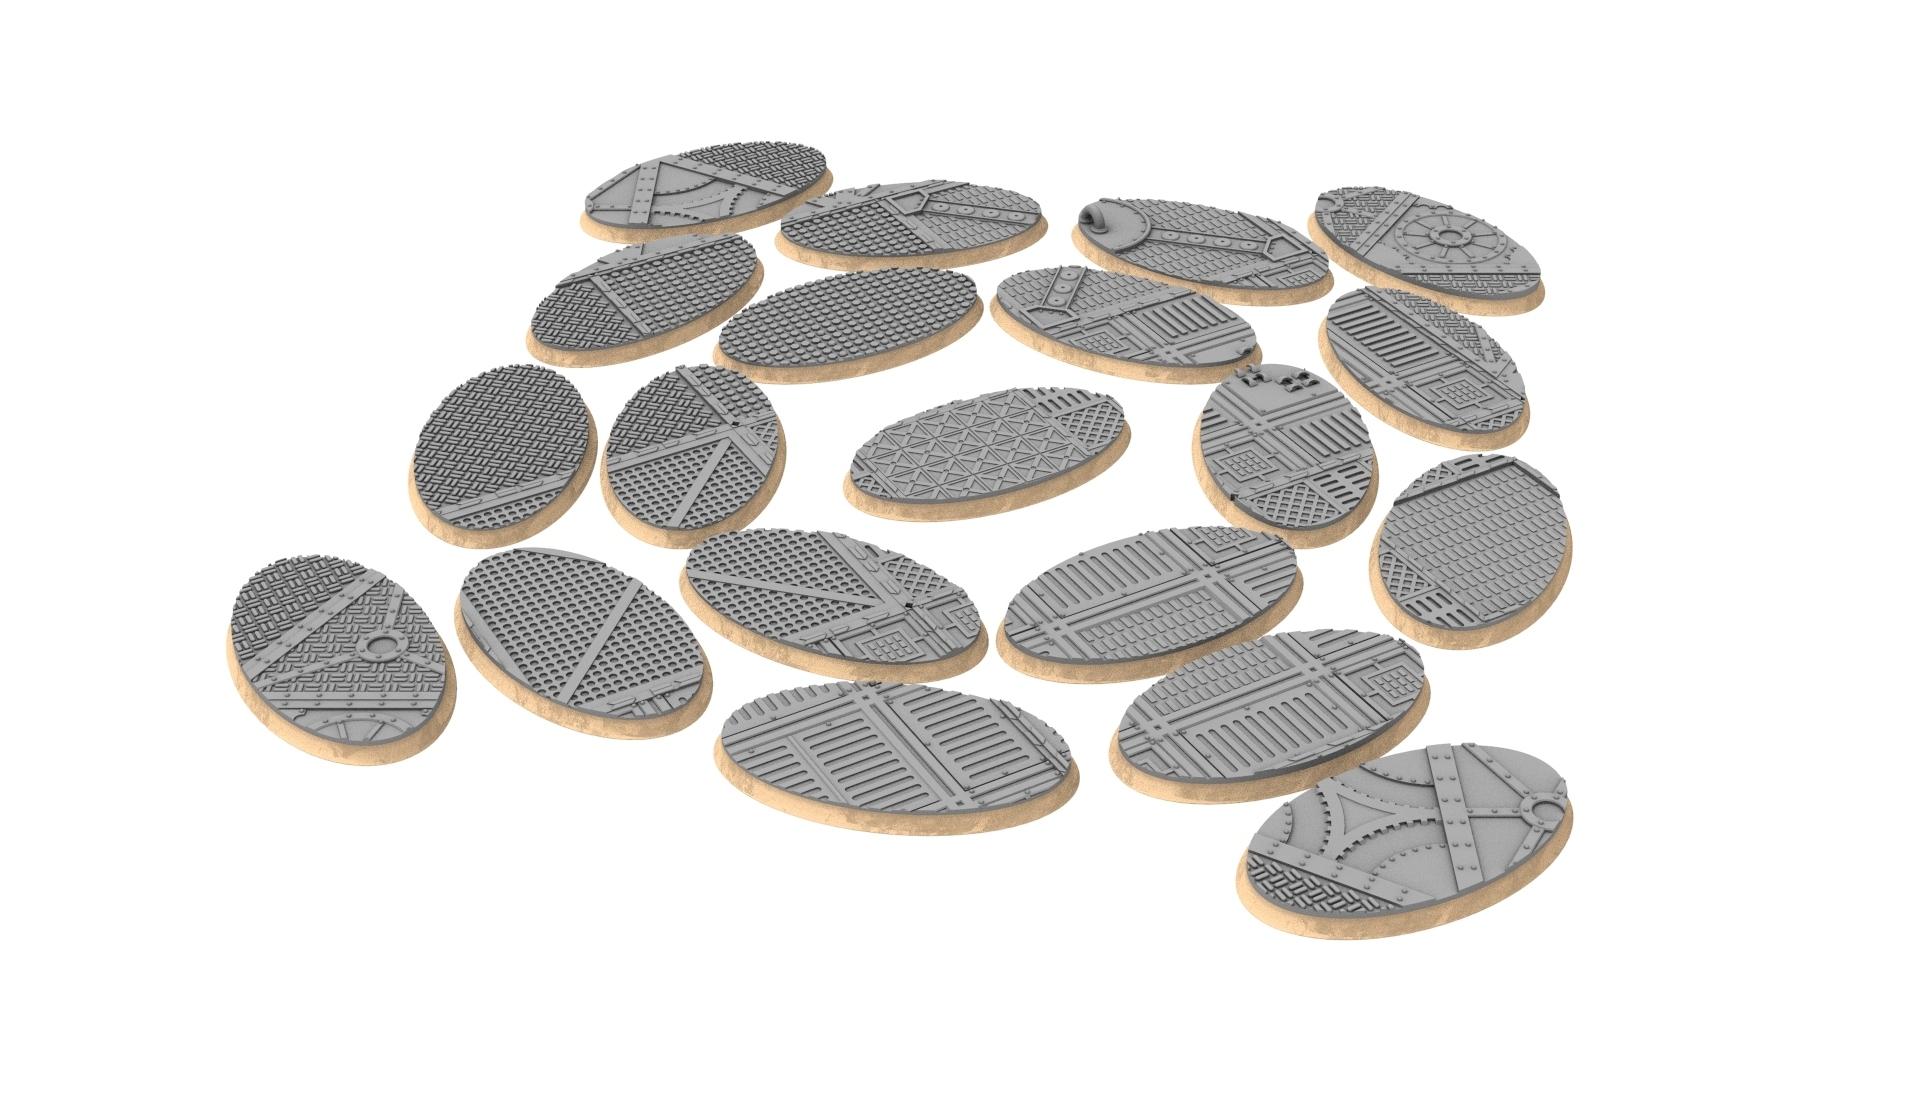 60x35.jpg Download STL file x1000 Round, oval, square, rectangular, hexagonal, industrial textured bases • 3D print design, Alario